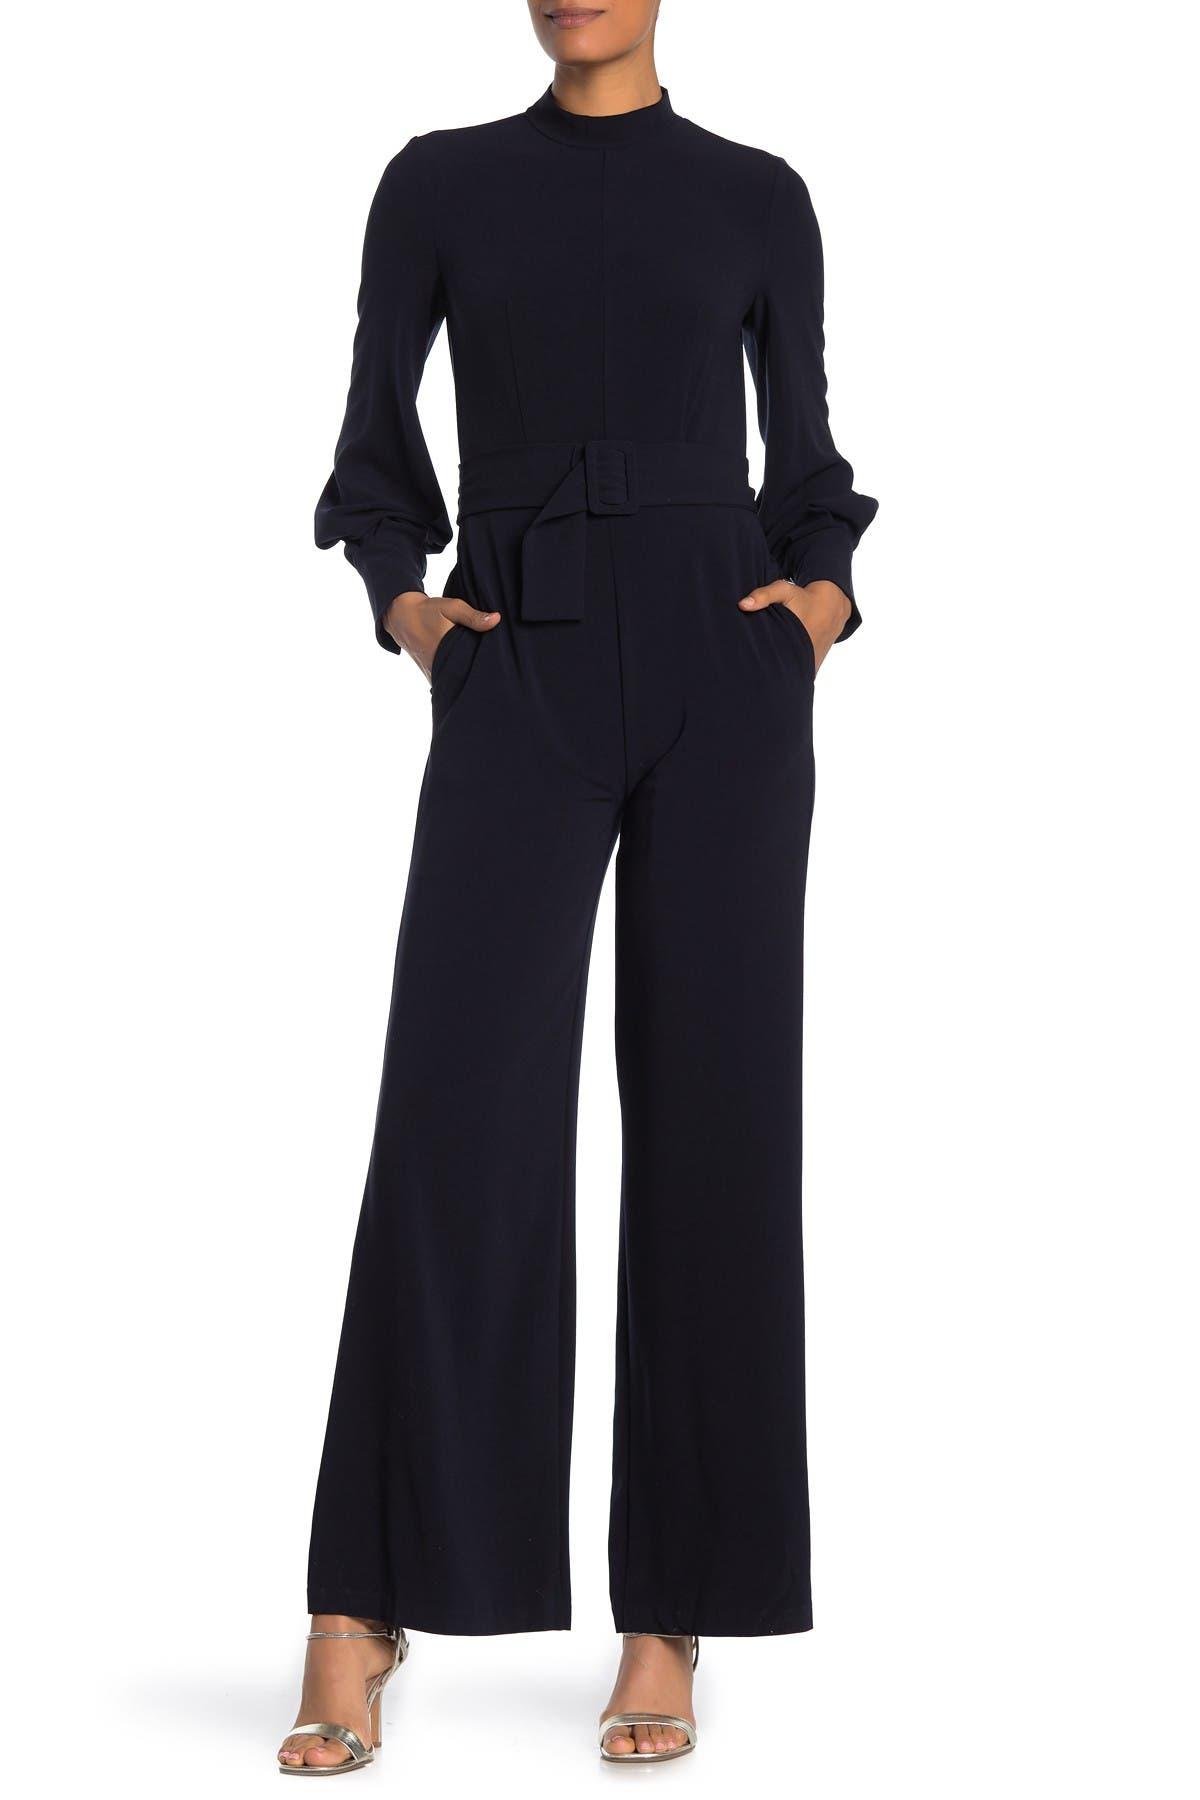 Image of Donna Morgan Long Sleeve Mock Neck Jumpsuit